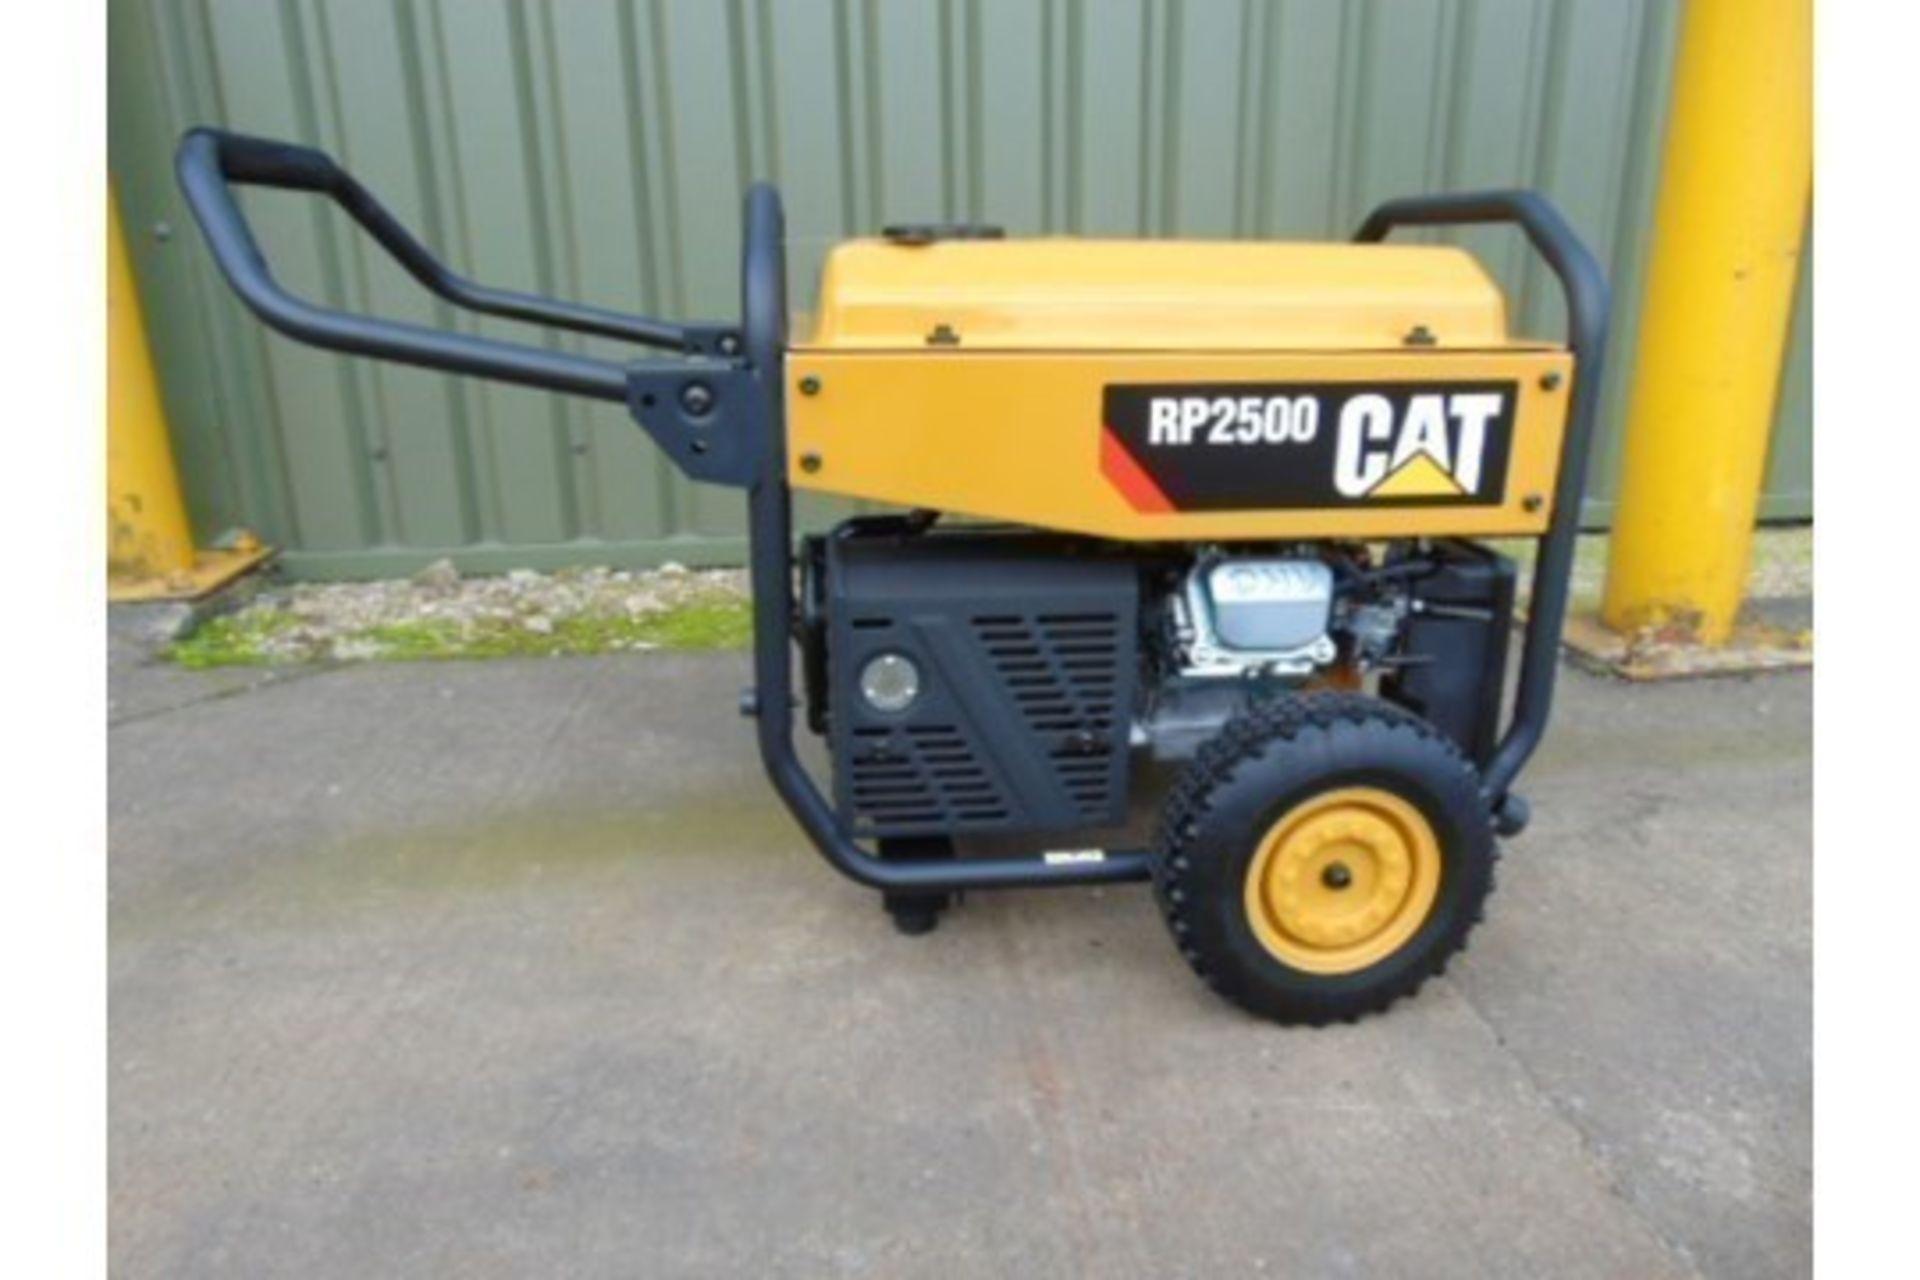 Lot 27195 - UNISSUED Caterpillar RP2500 Industrial Petrol Generator Set